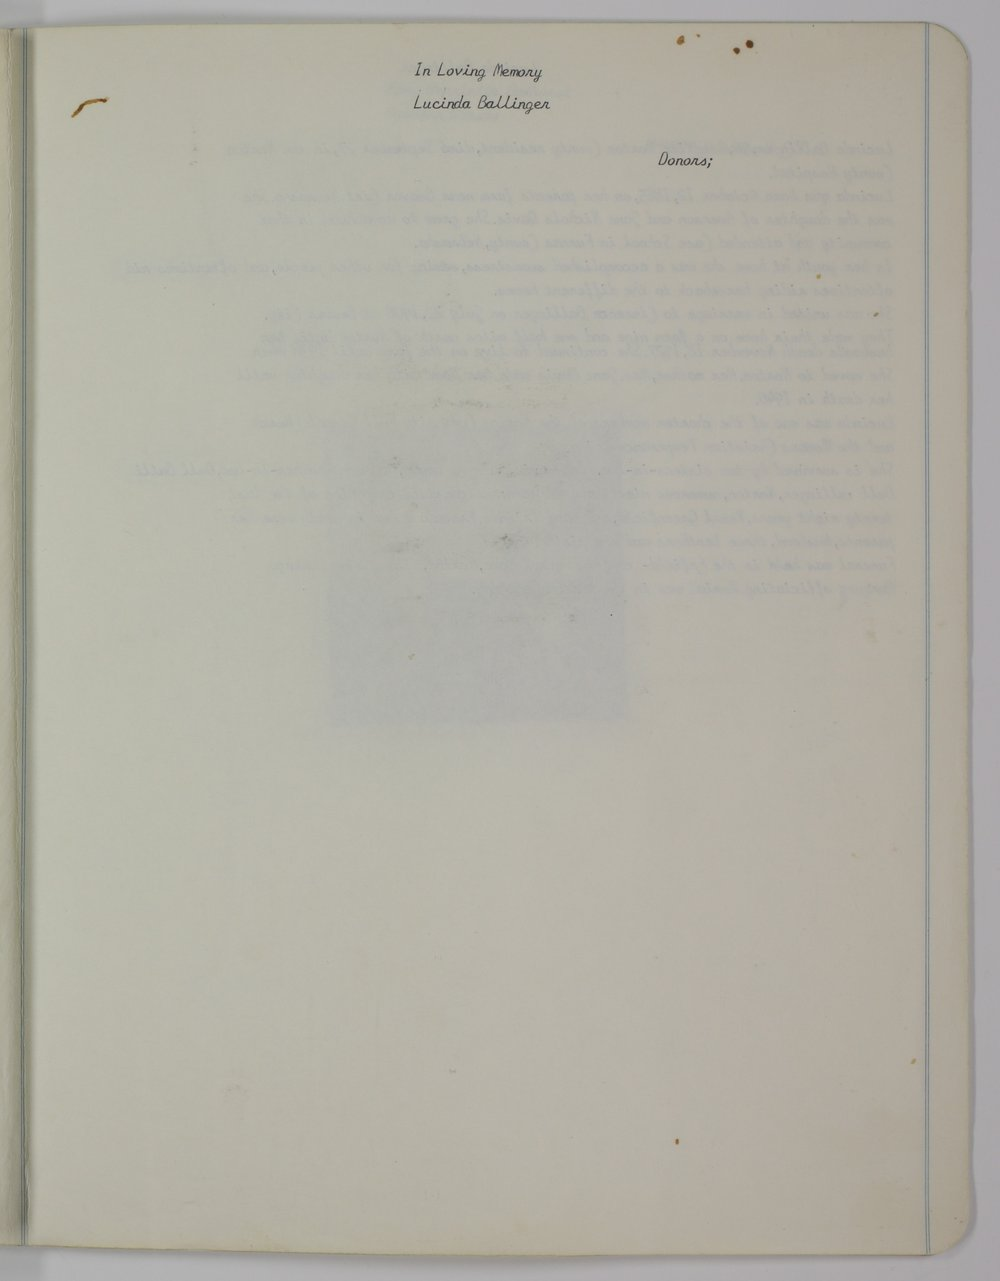 Kansas Woman's Christian Temperance Union memory book - 10